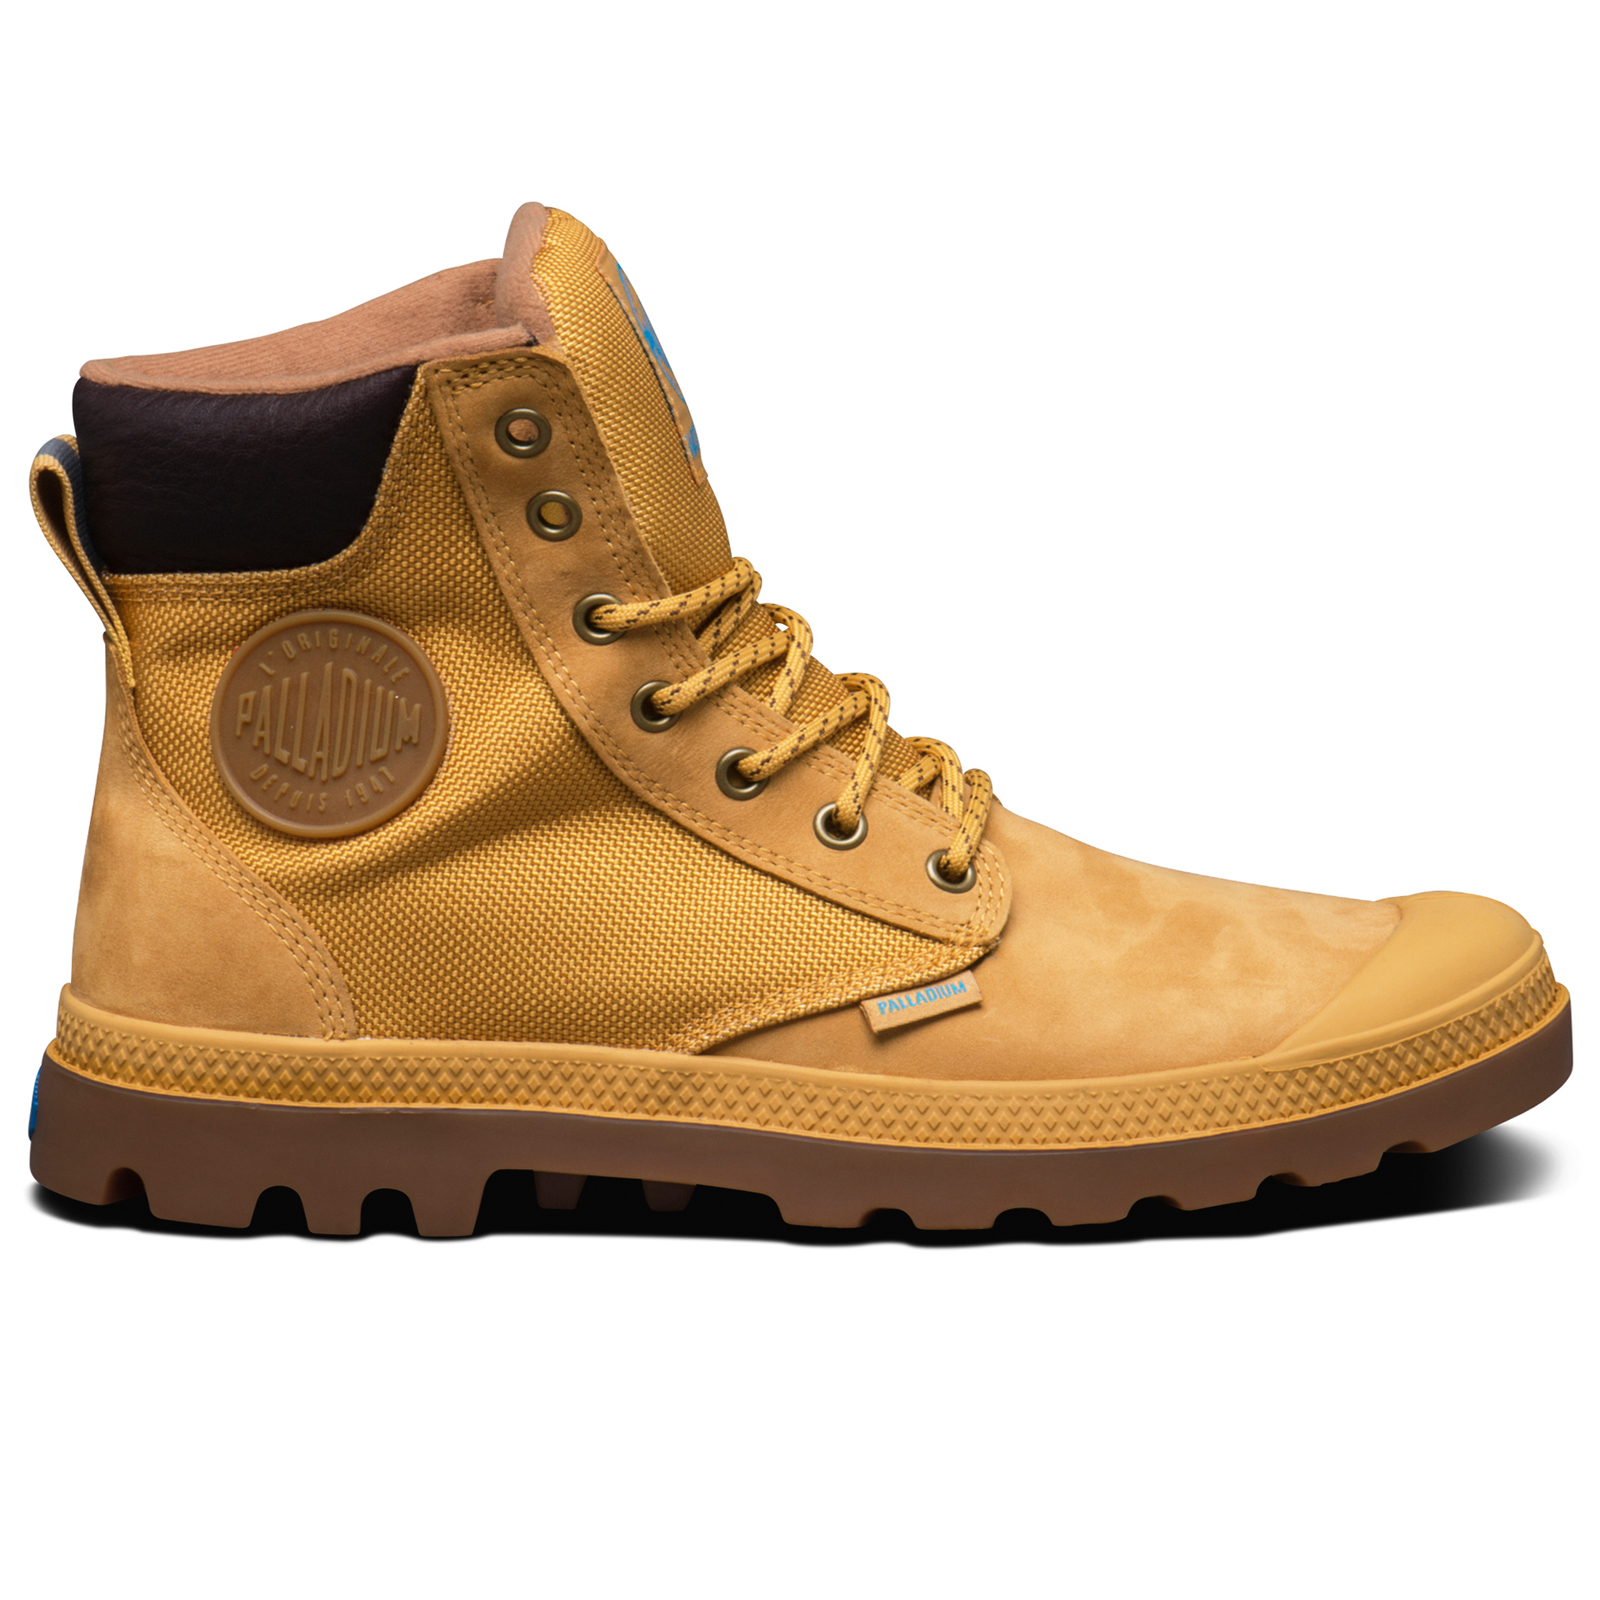 Palladium Pampa Sport  Uomo Schuhes Damenschuhe Waterproof Stiefel Walking High Top Ankle Stiefel Waterproof 115d1d